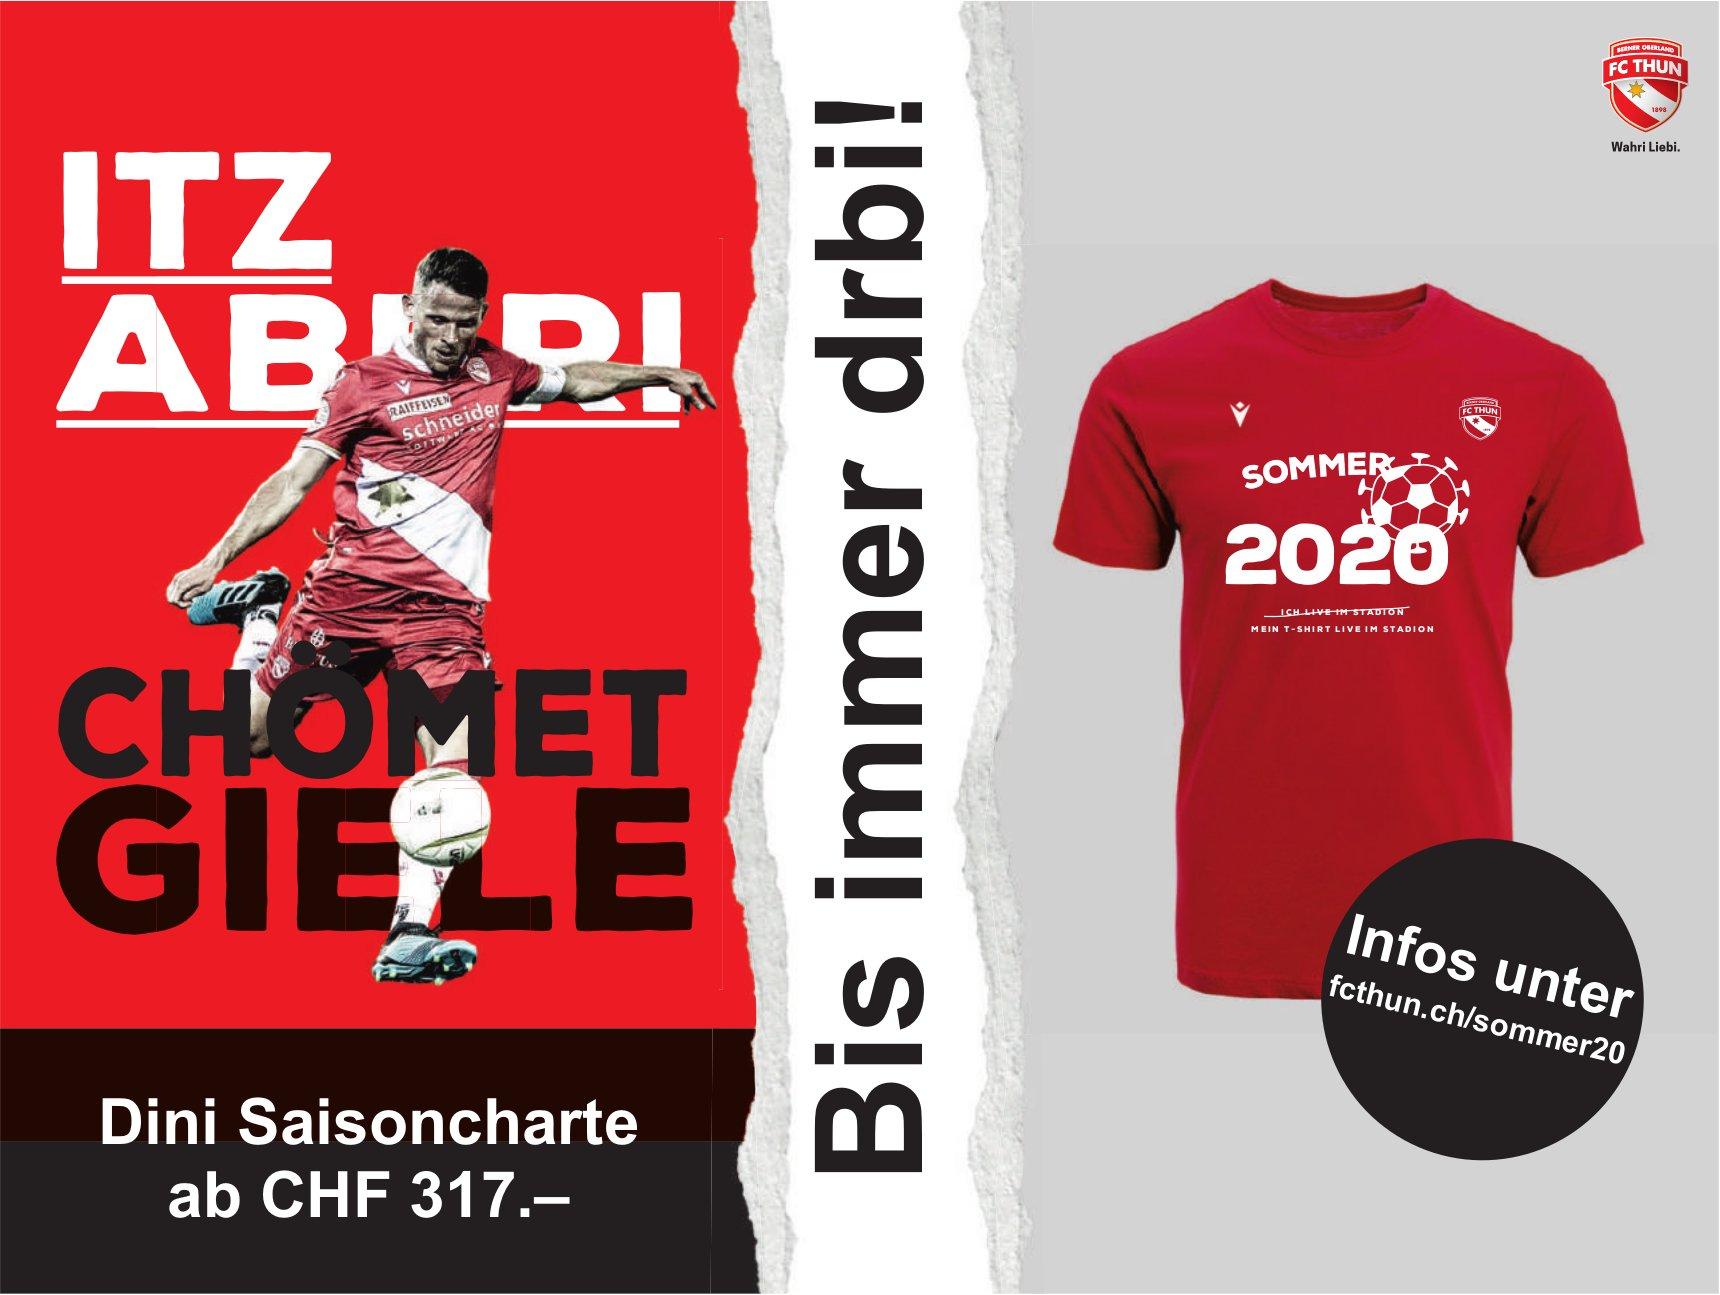 FC Thun - Dini Saisoncharte ab Chf 317.– Bis immer drbi!